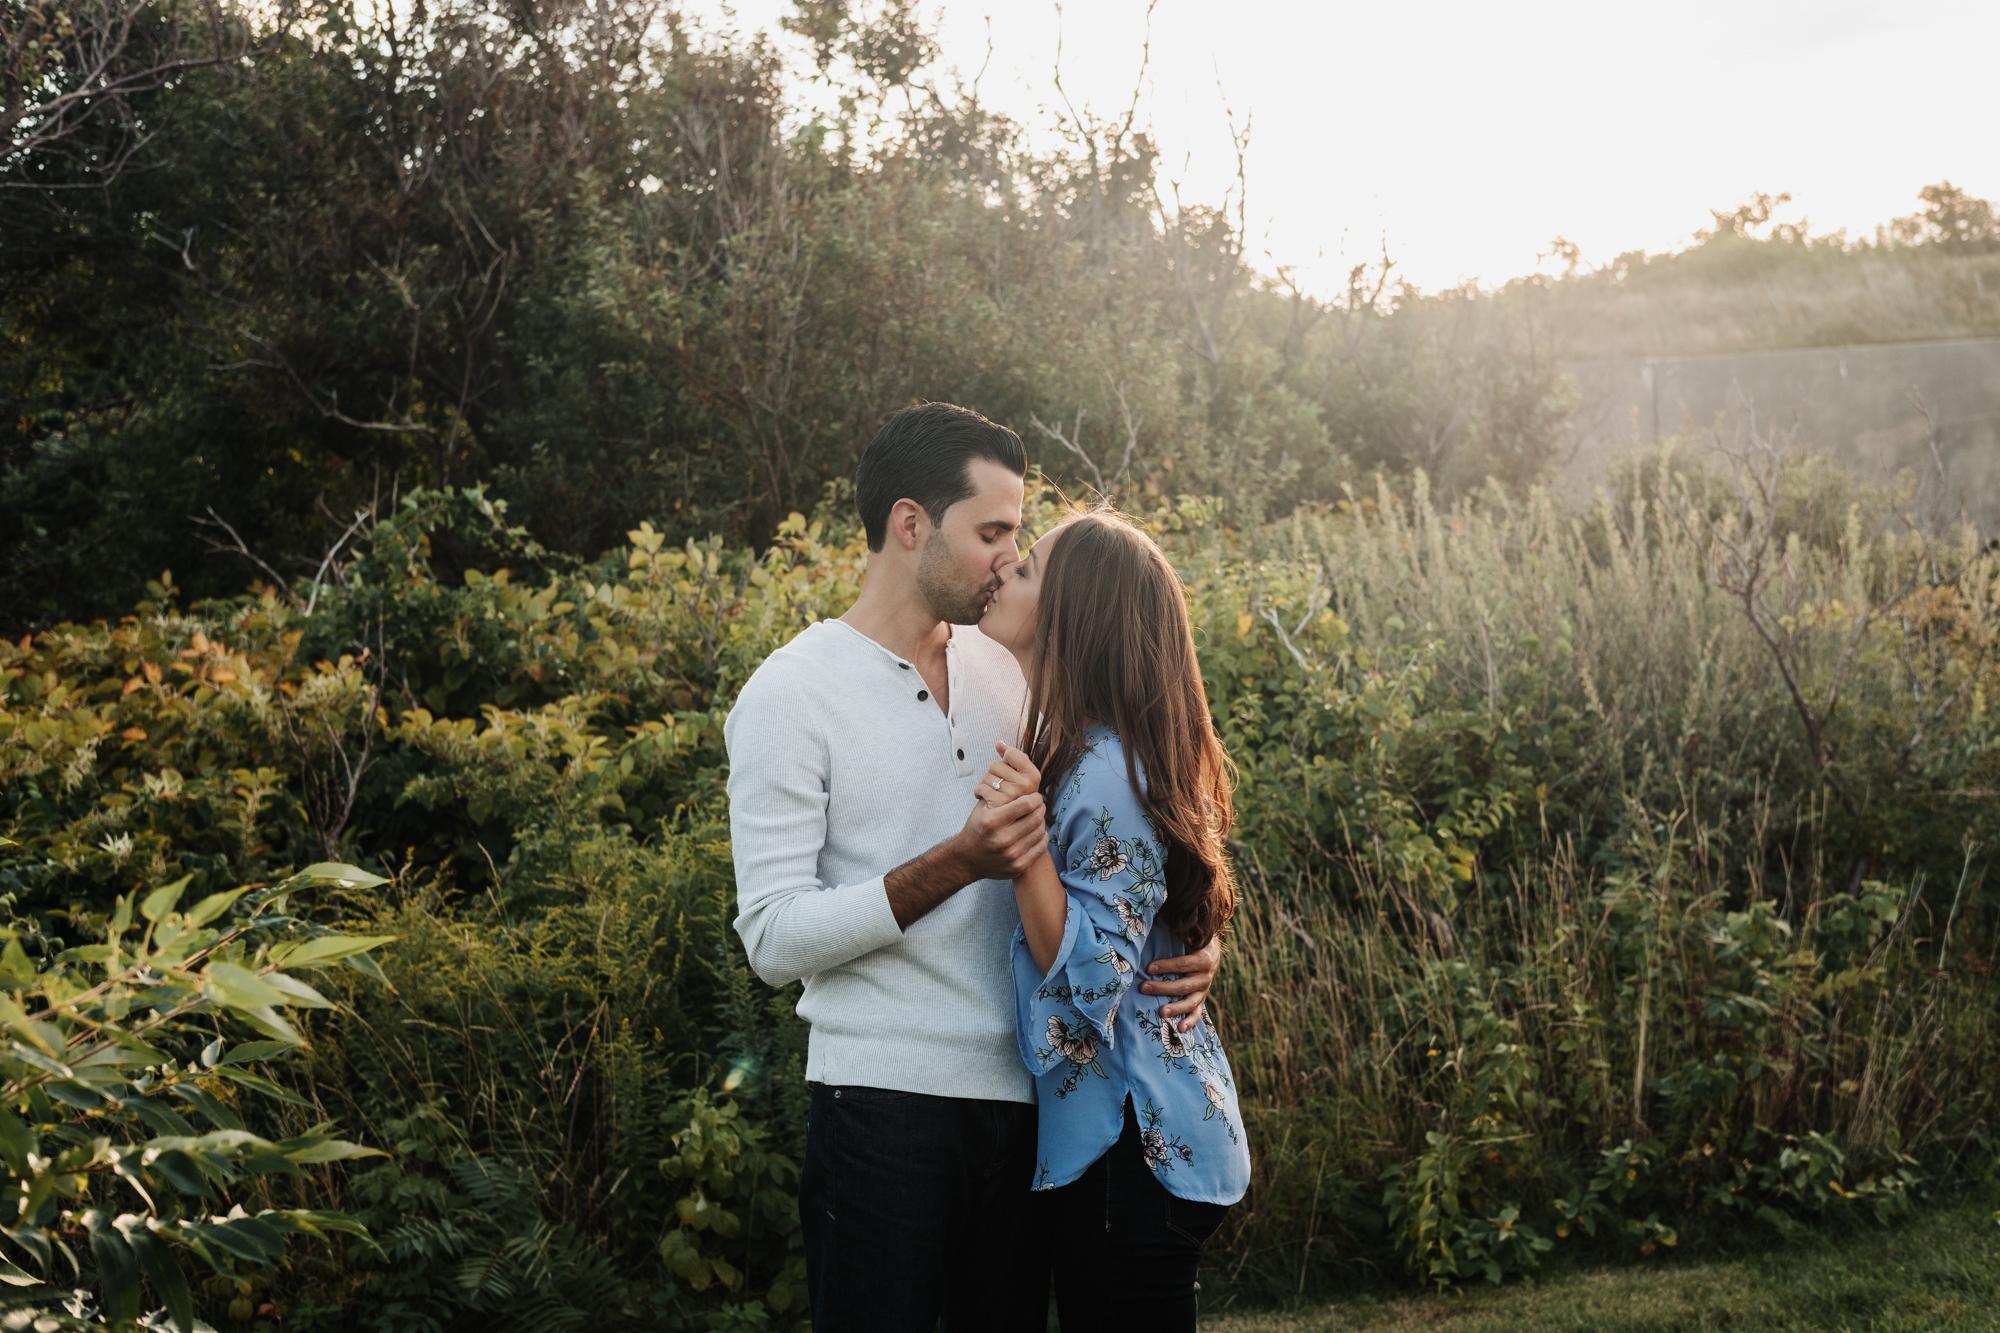 Wedding_Francis_Boucher_Engagement_Nahant_MA_2018-6.jpg